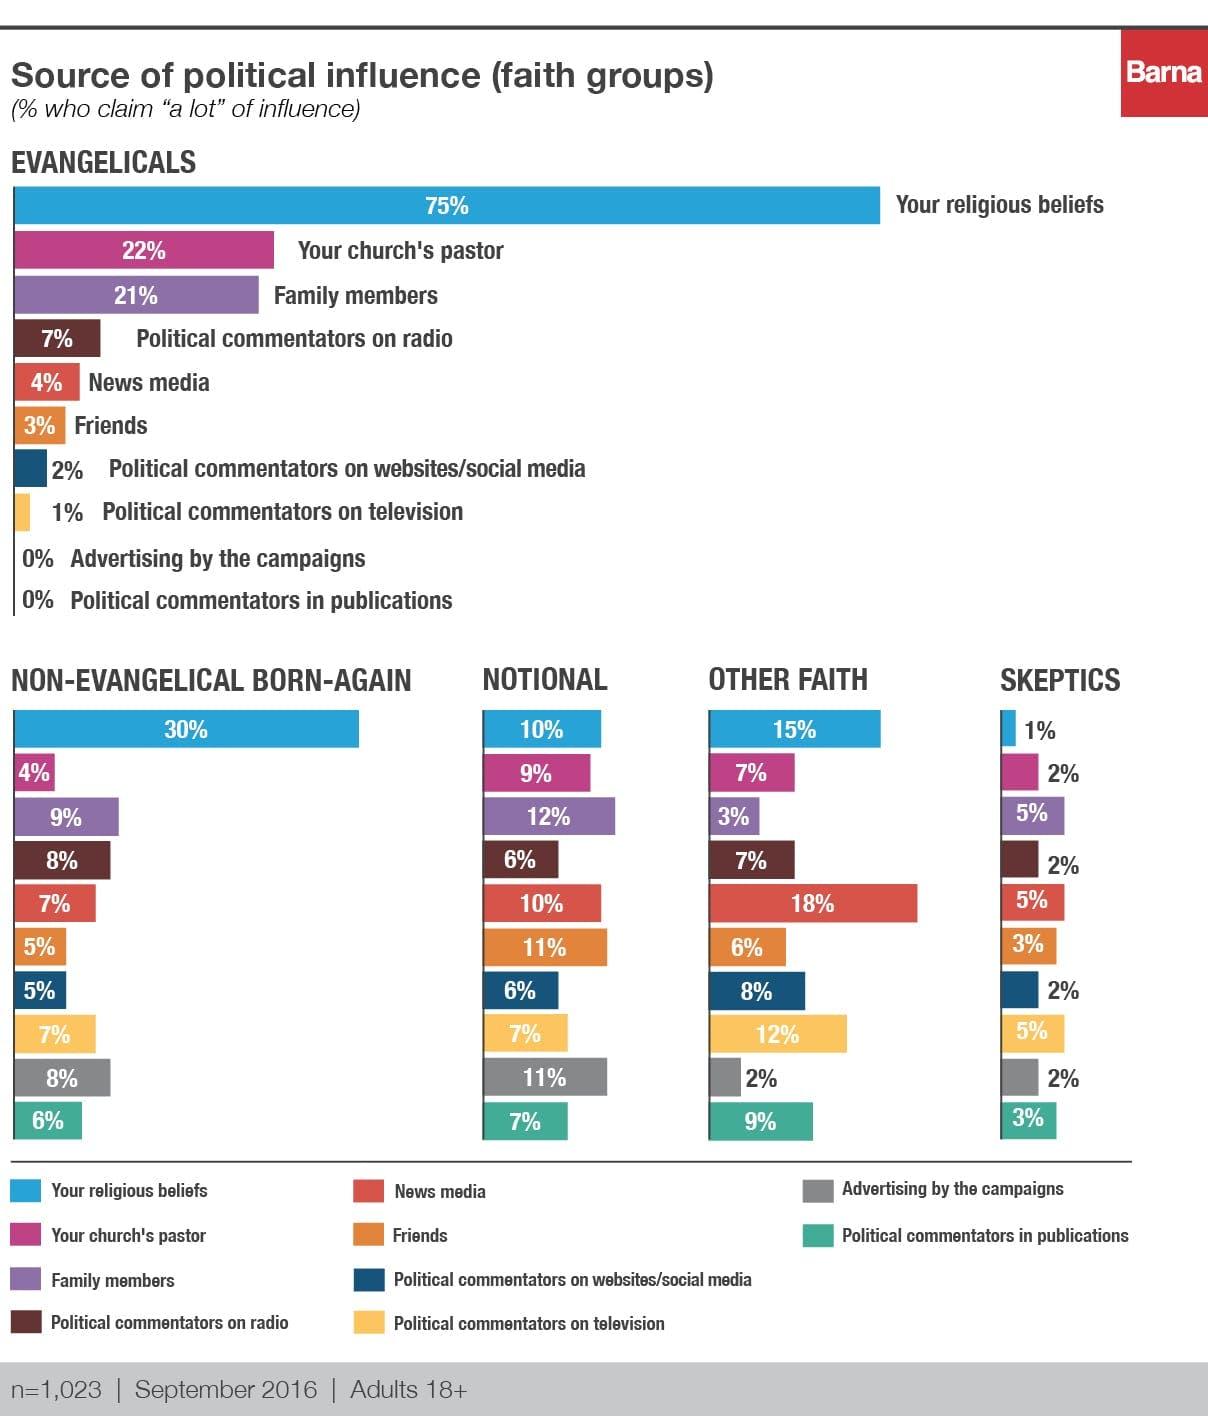 barna_politicalinfluence_charts_v6